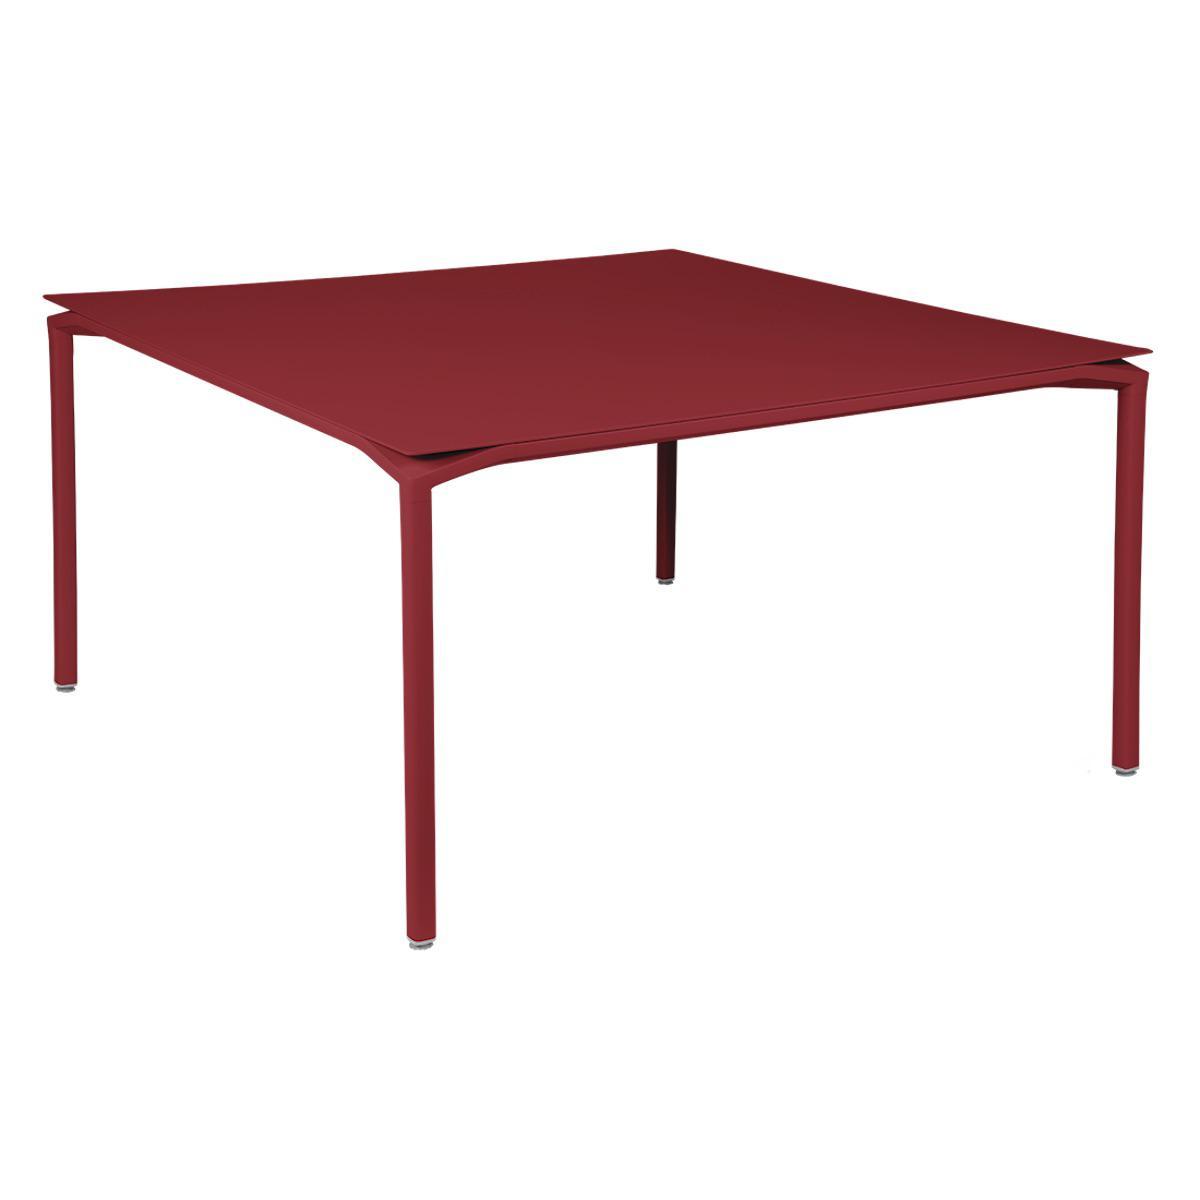 Table 140x140cm CALVI Fermob piment